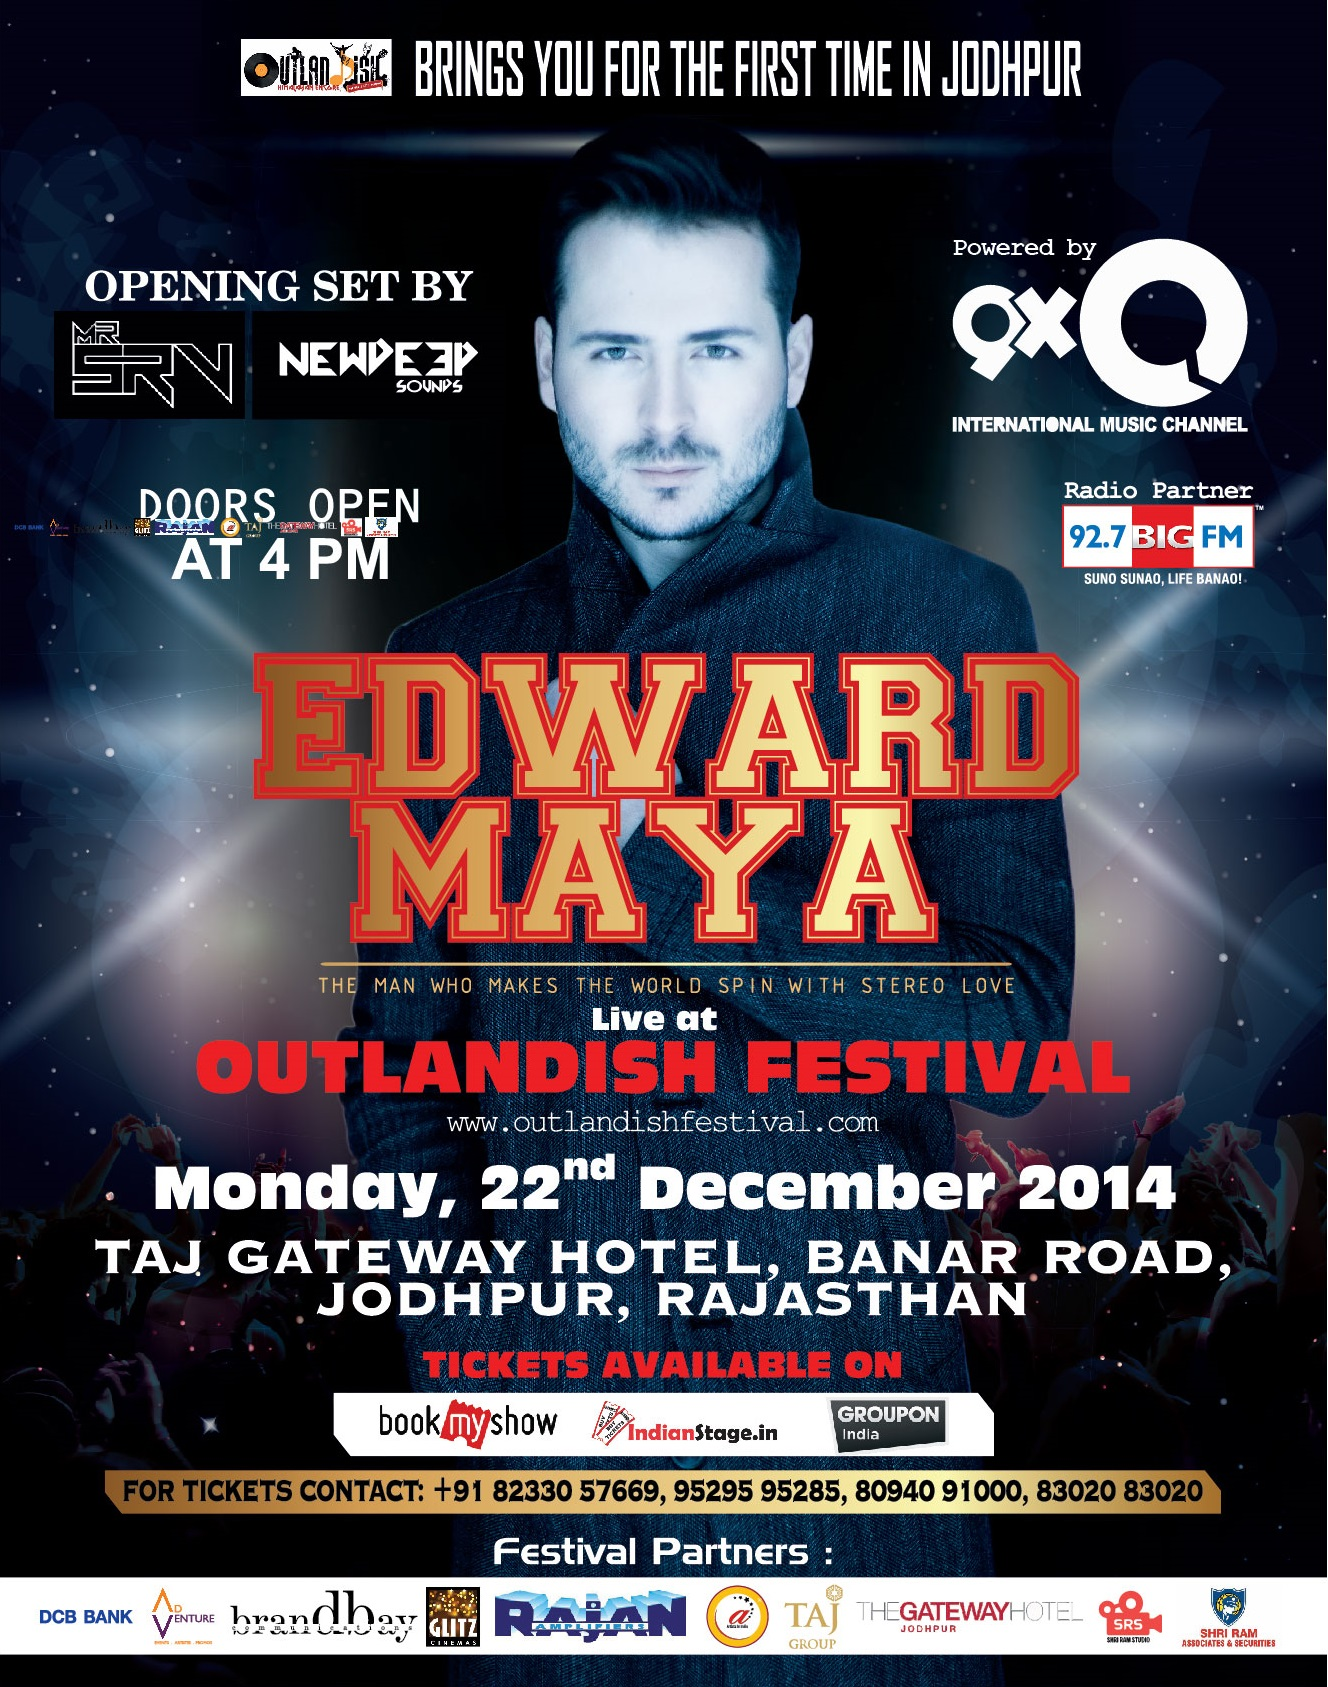 Outlandish Festival, 2014